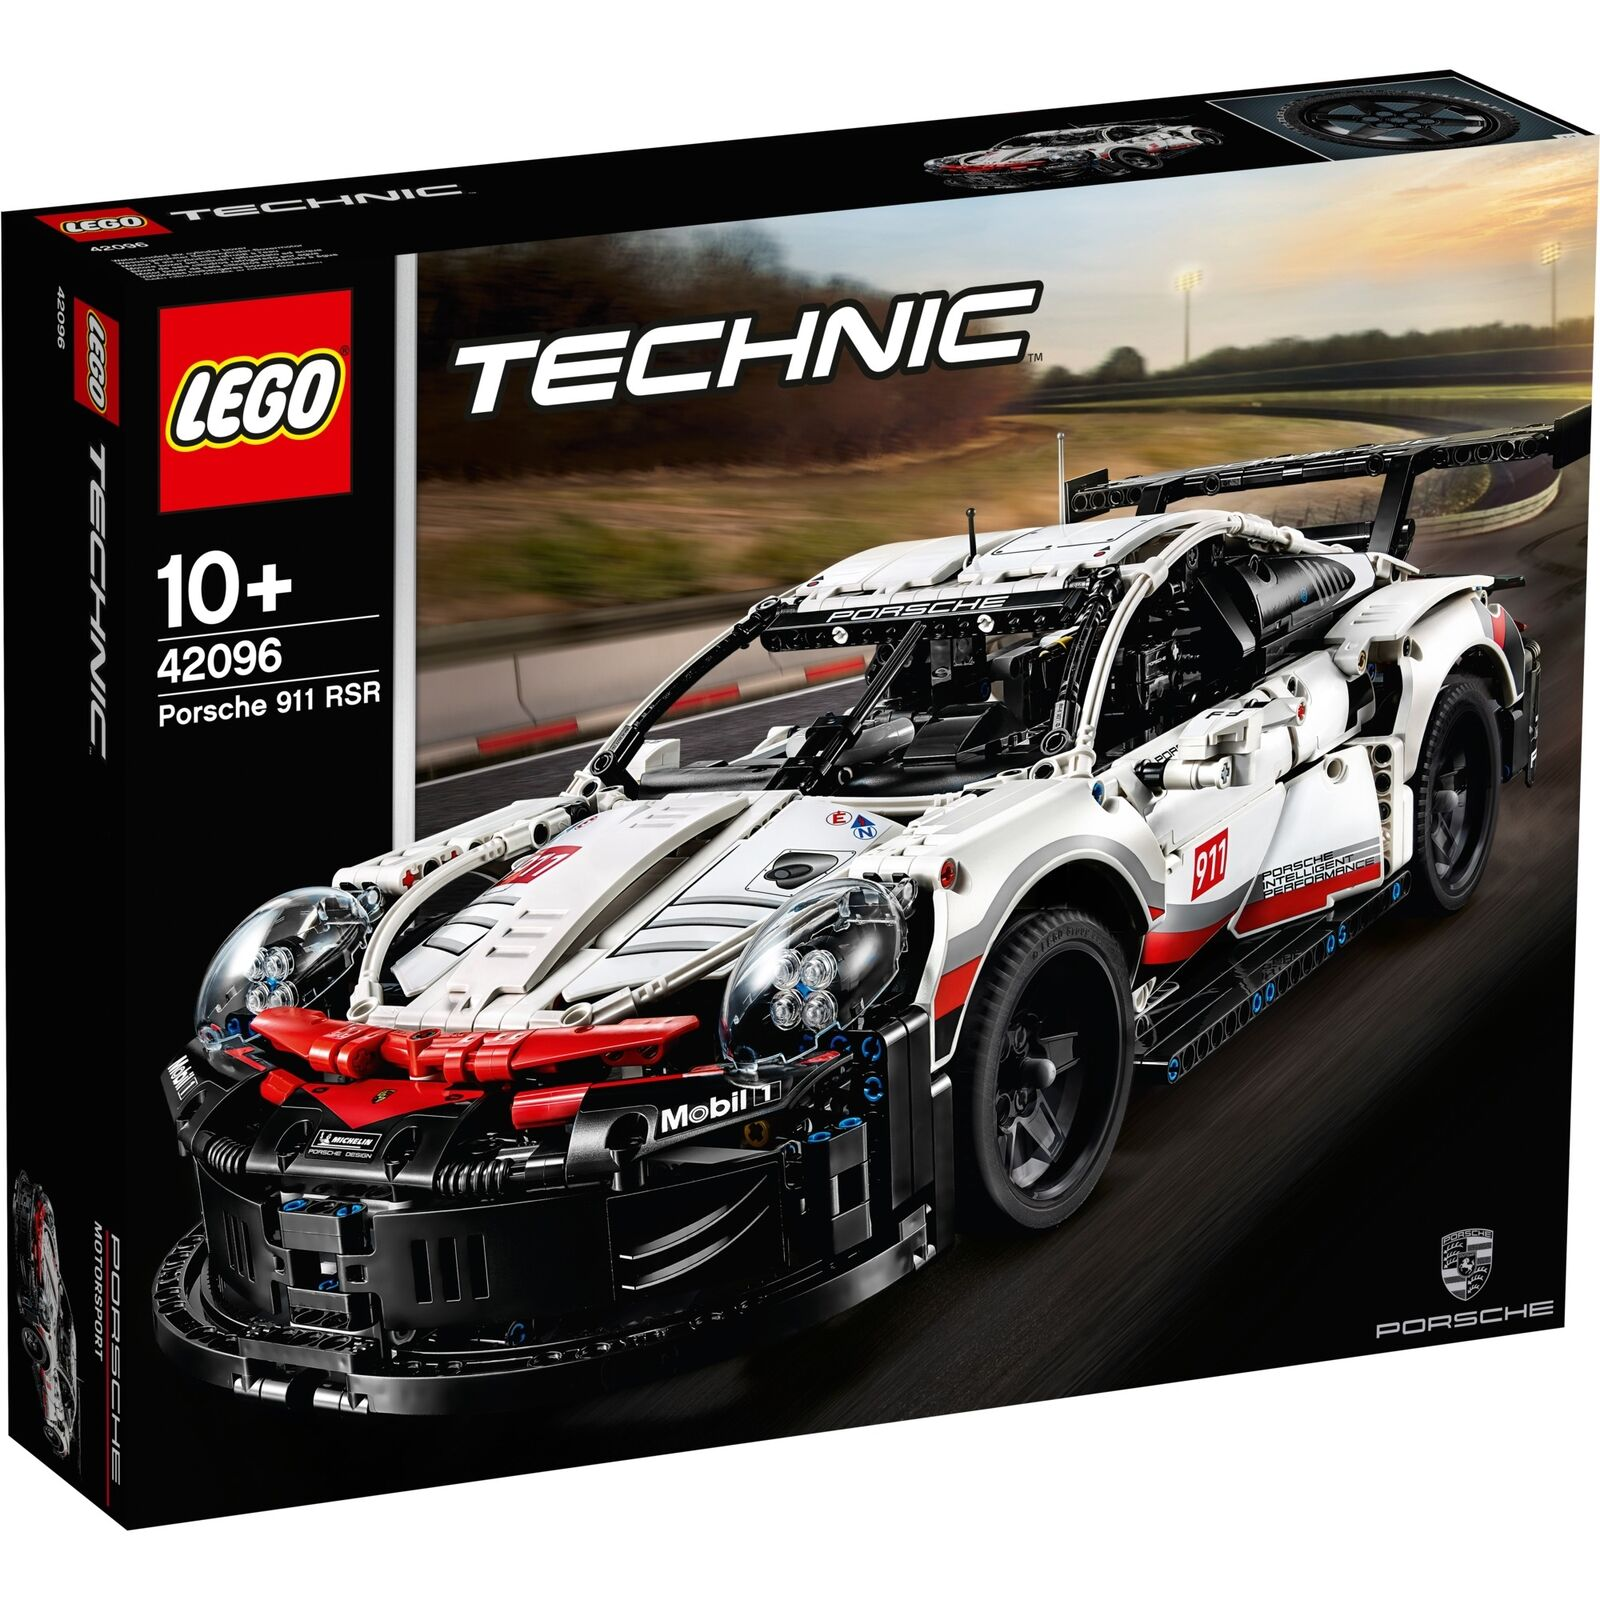 LEGO Technic Porsche 911 RSR Konstruktionsspielzeug